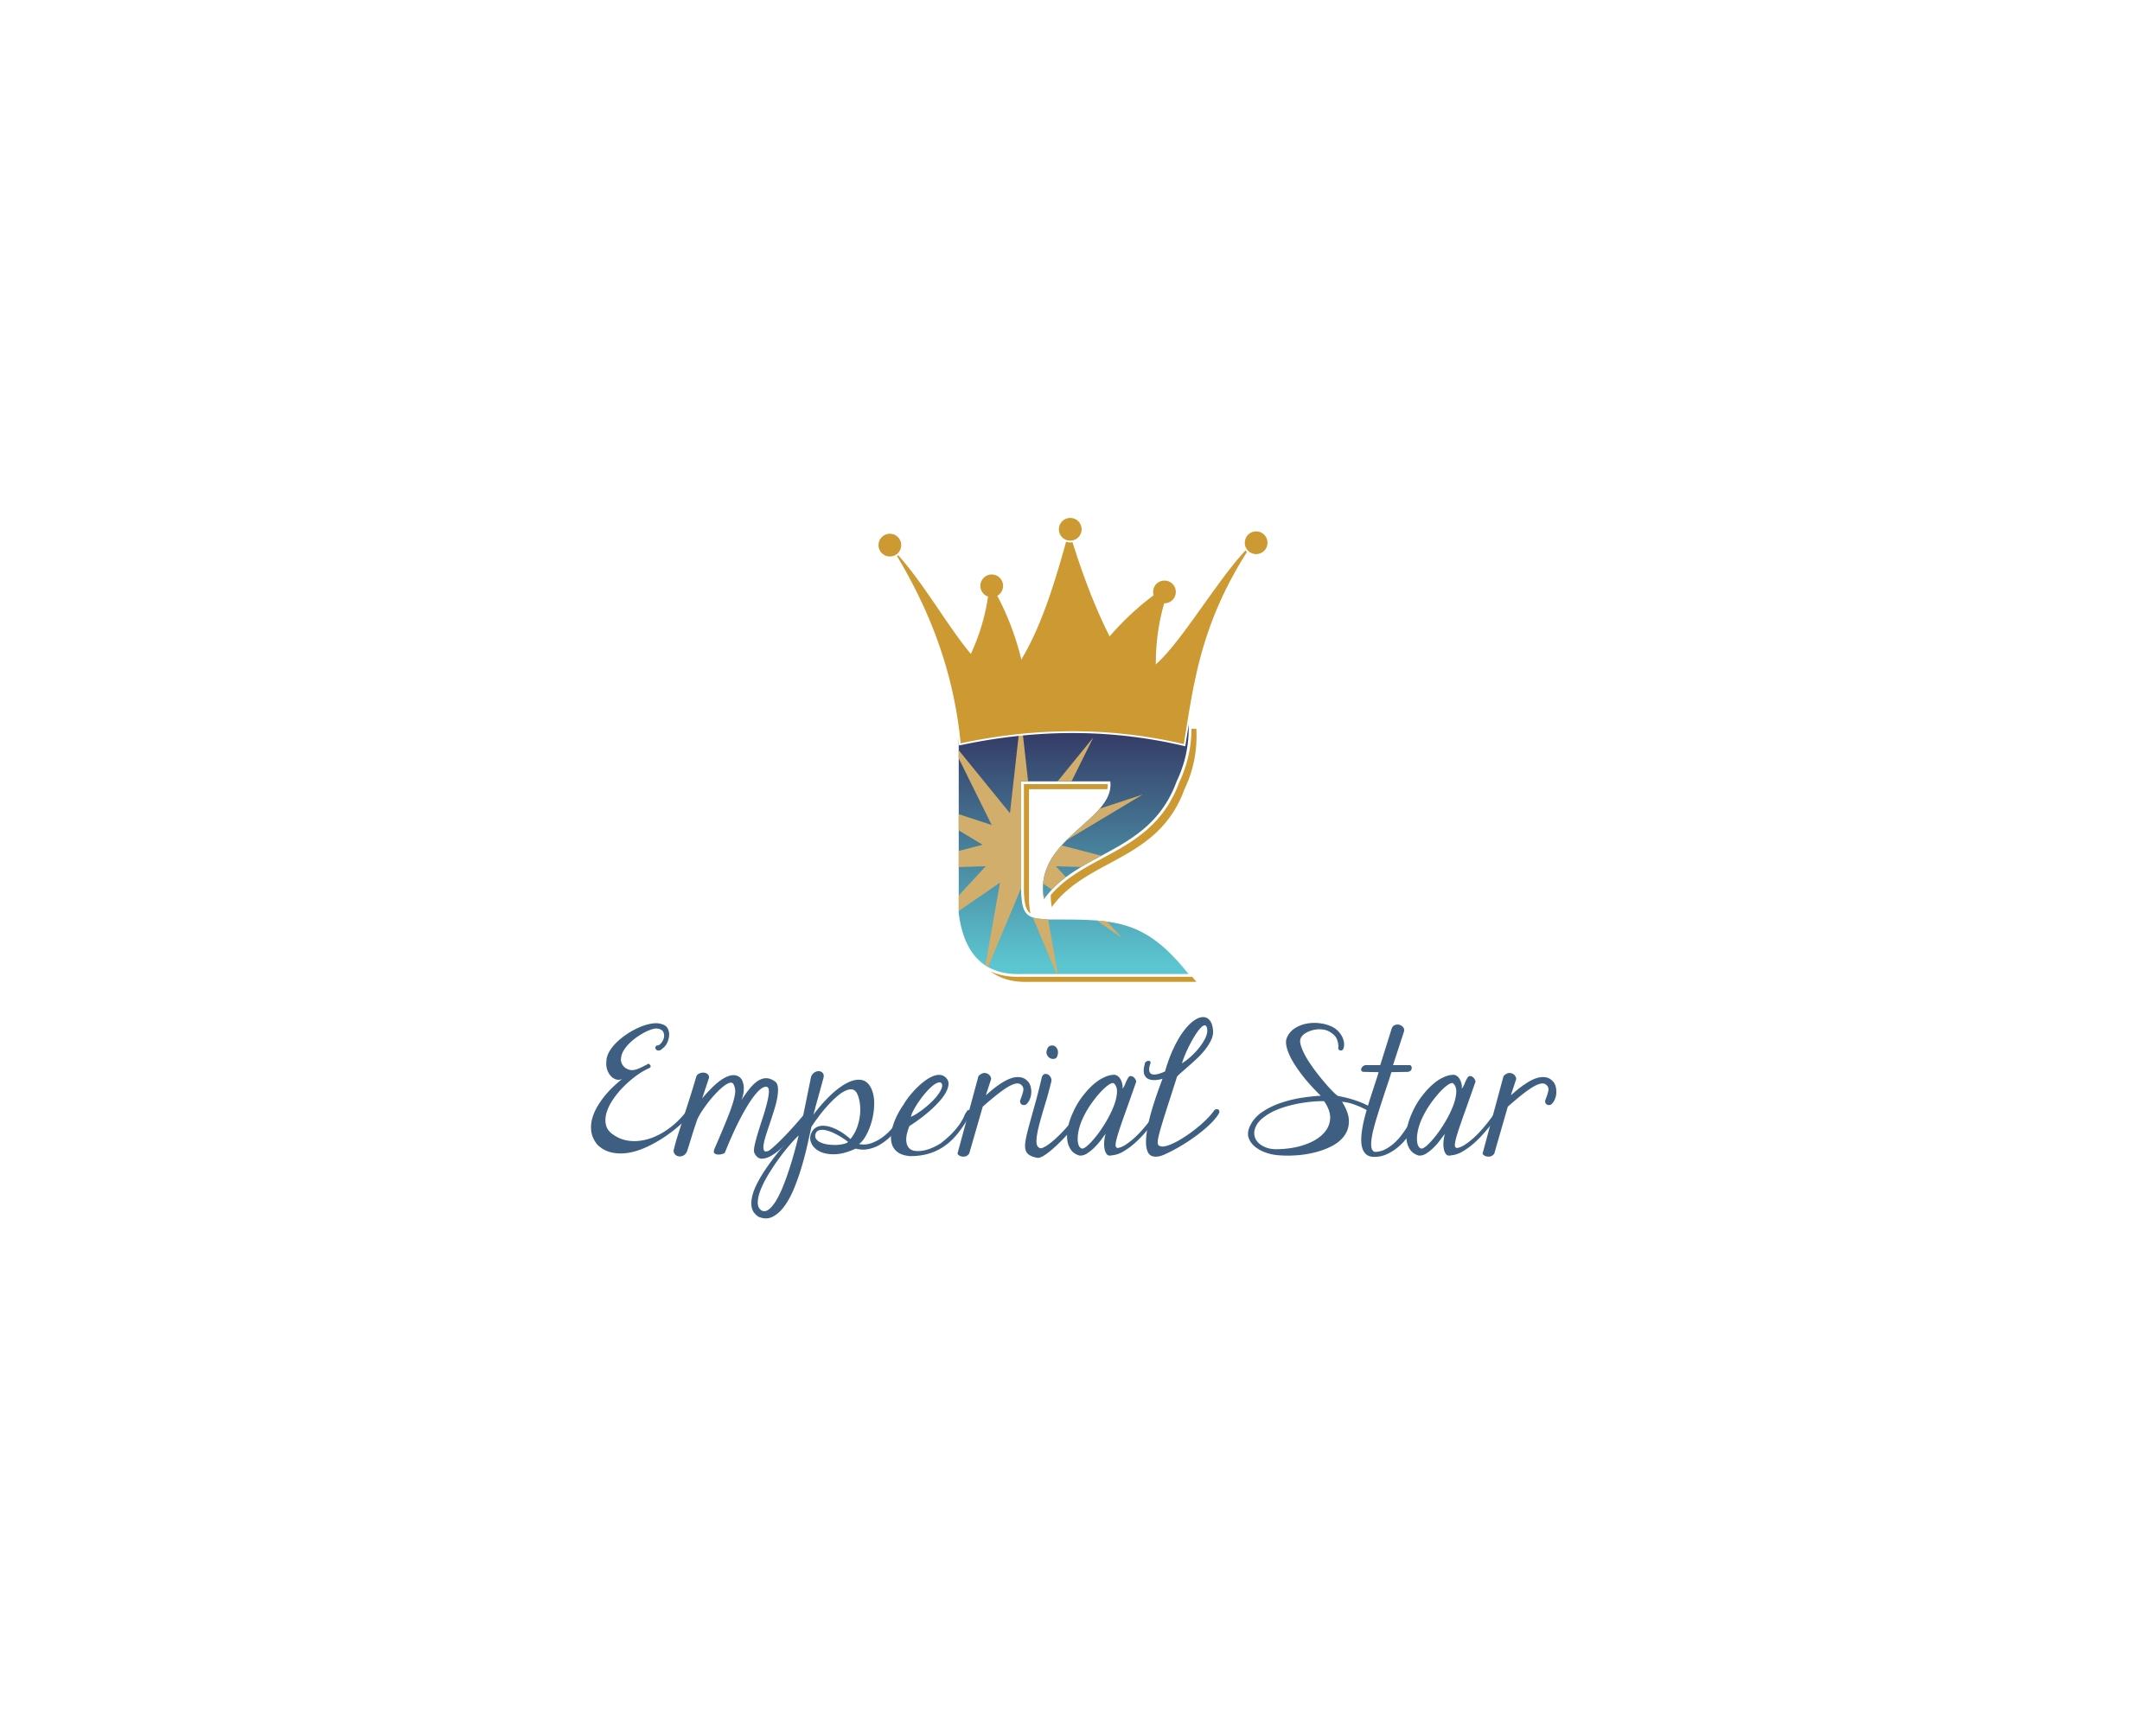 Logo Design by dbb201 - Entry No. 140 in the Logo Design Contest Emperial Star Logo Design.